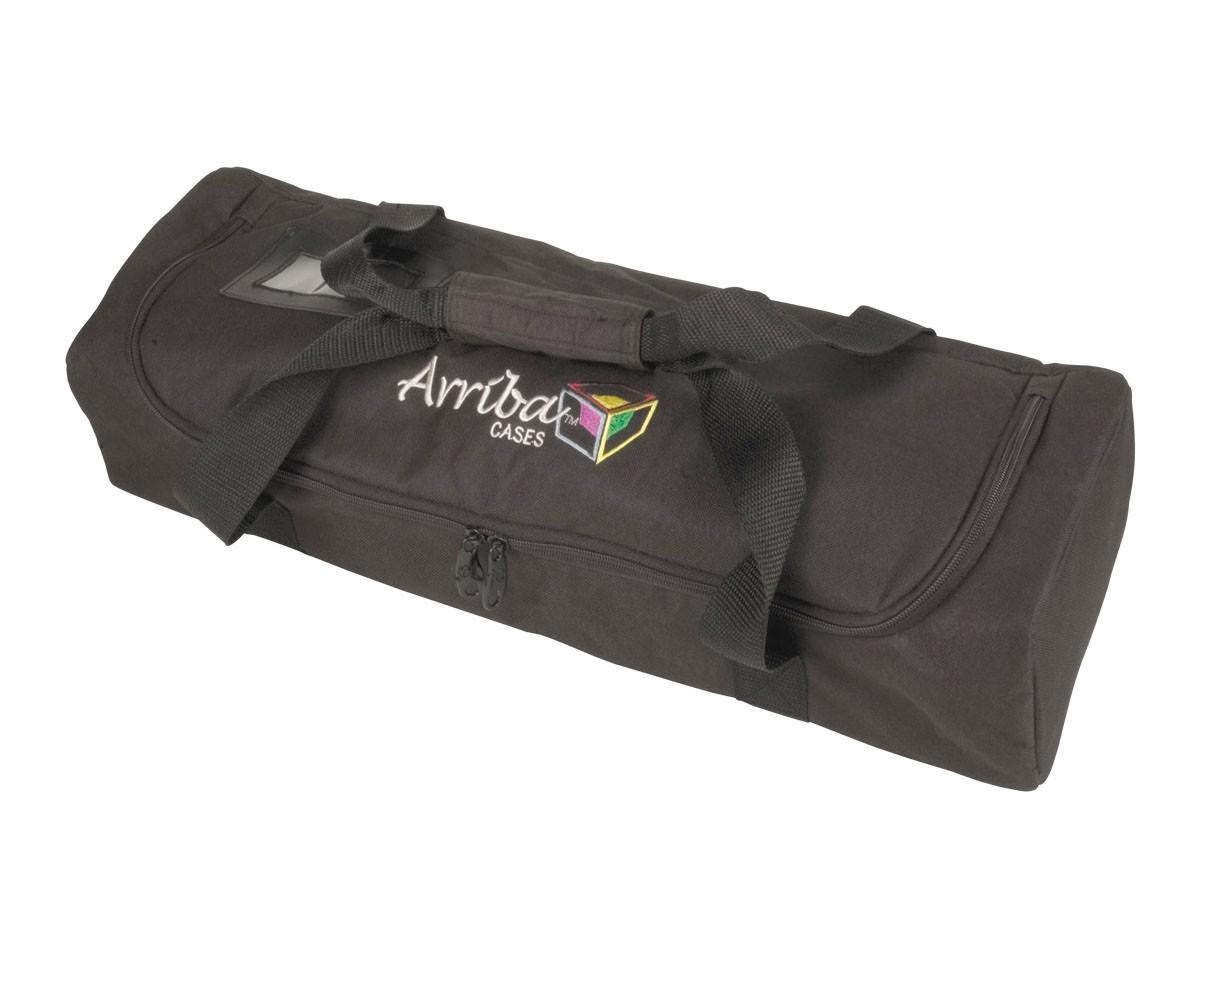 Arriba Cases AC-205